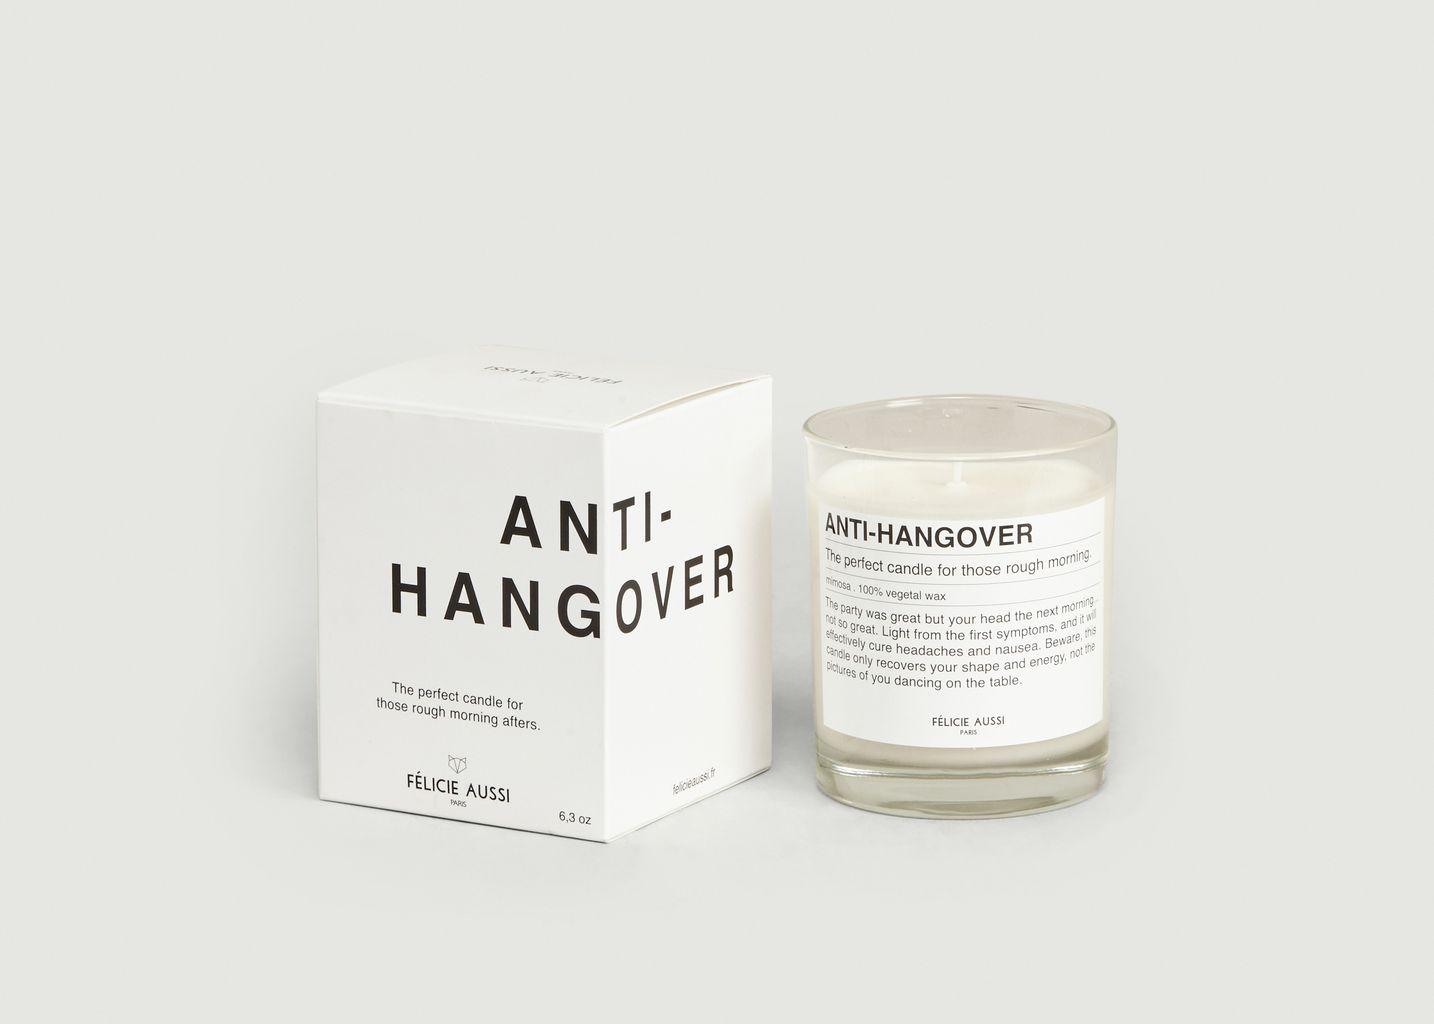 Bougie Anti-Hangover - Felicie Aussi